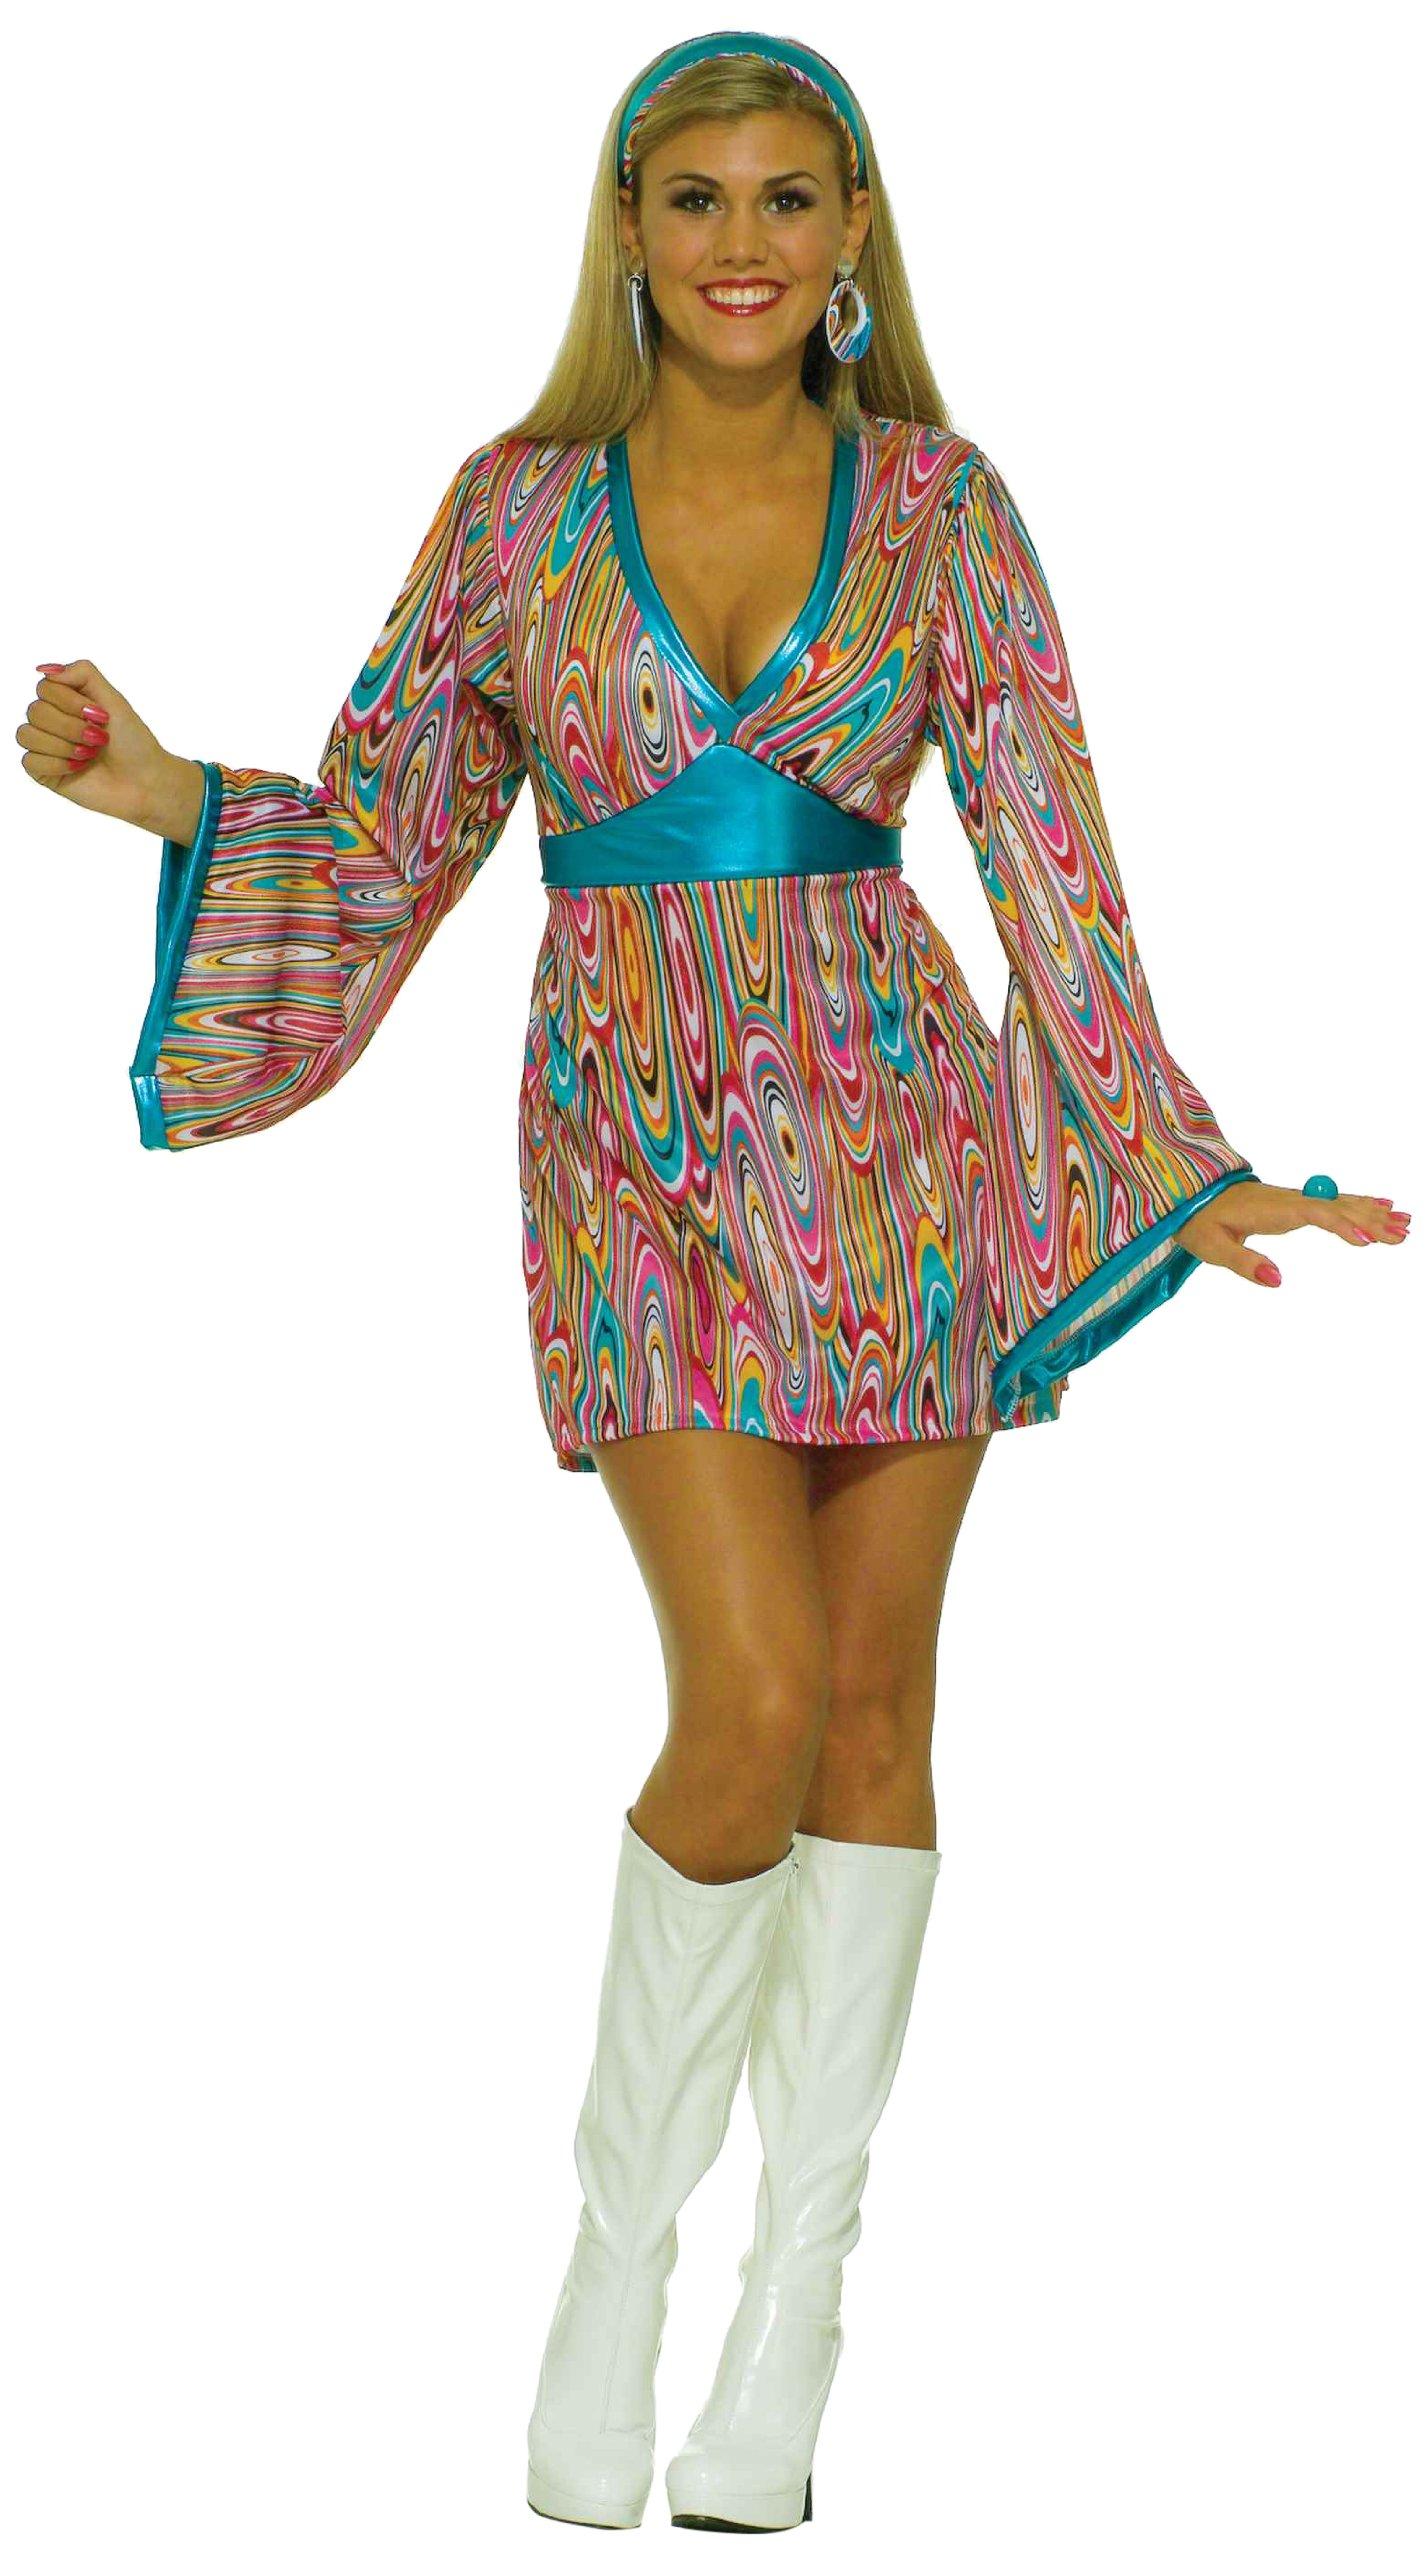 Forum Novelties Women's 60's Revolution Wild Swirl Go-Go Costume, Multi, X-Small/Small by Forum Novelties